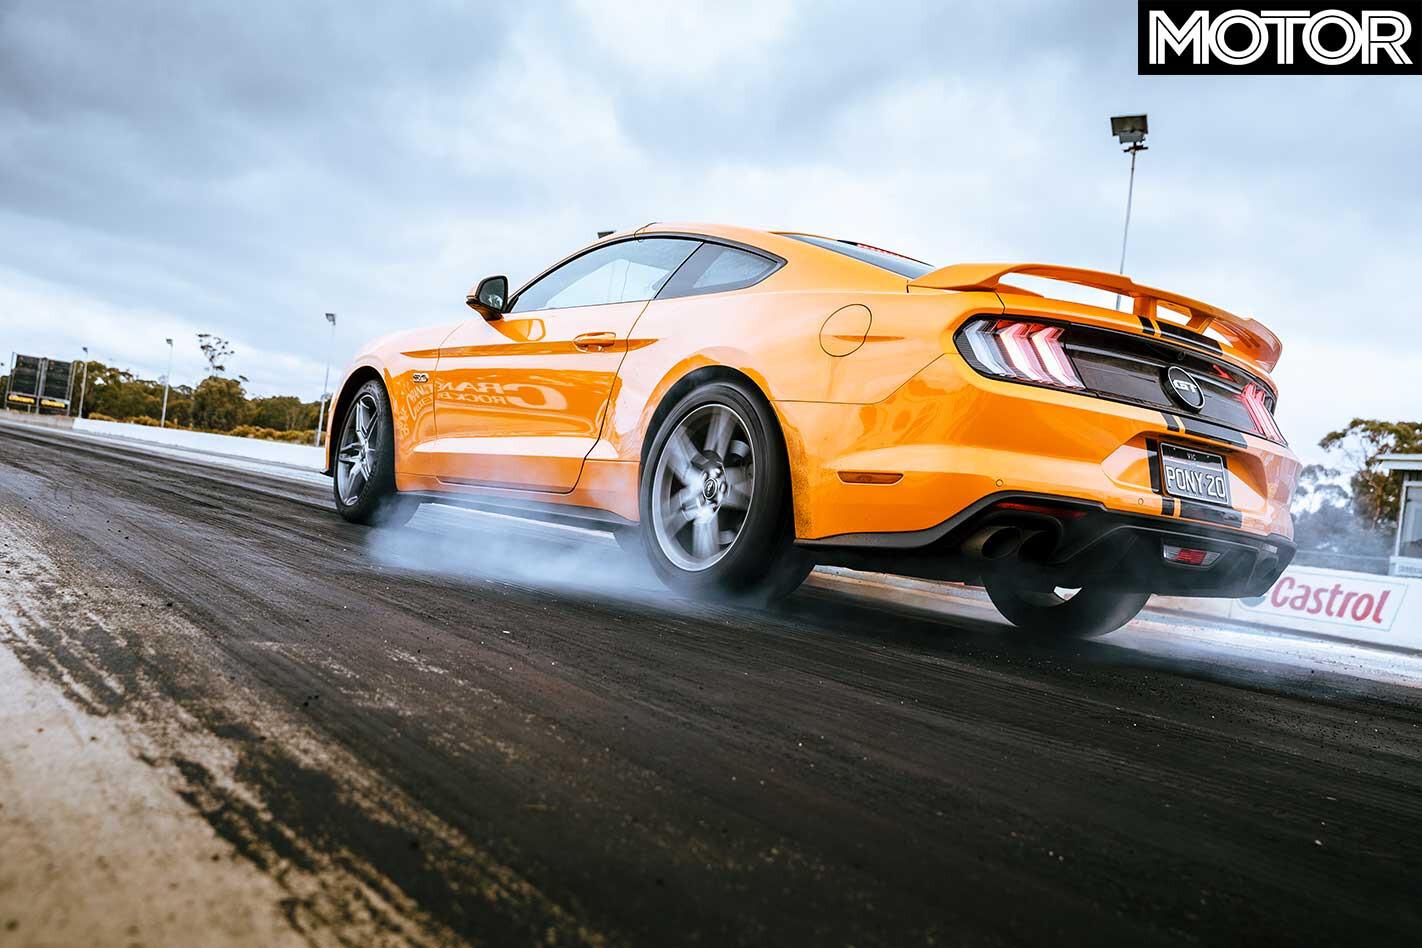 2018 Ford Mustang GT Drag Strip Burnout Jpg